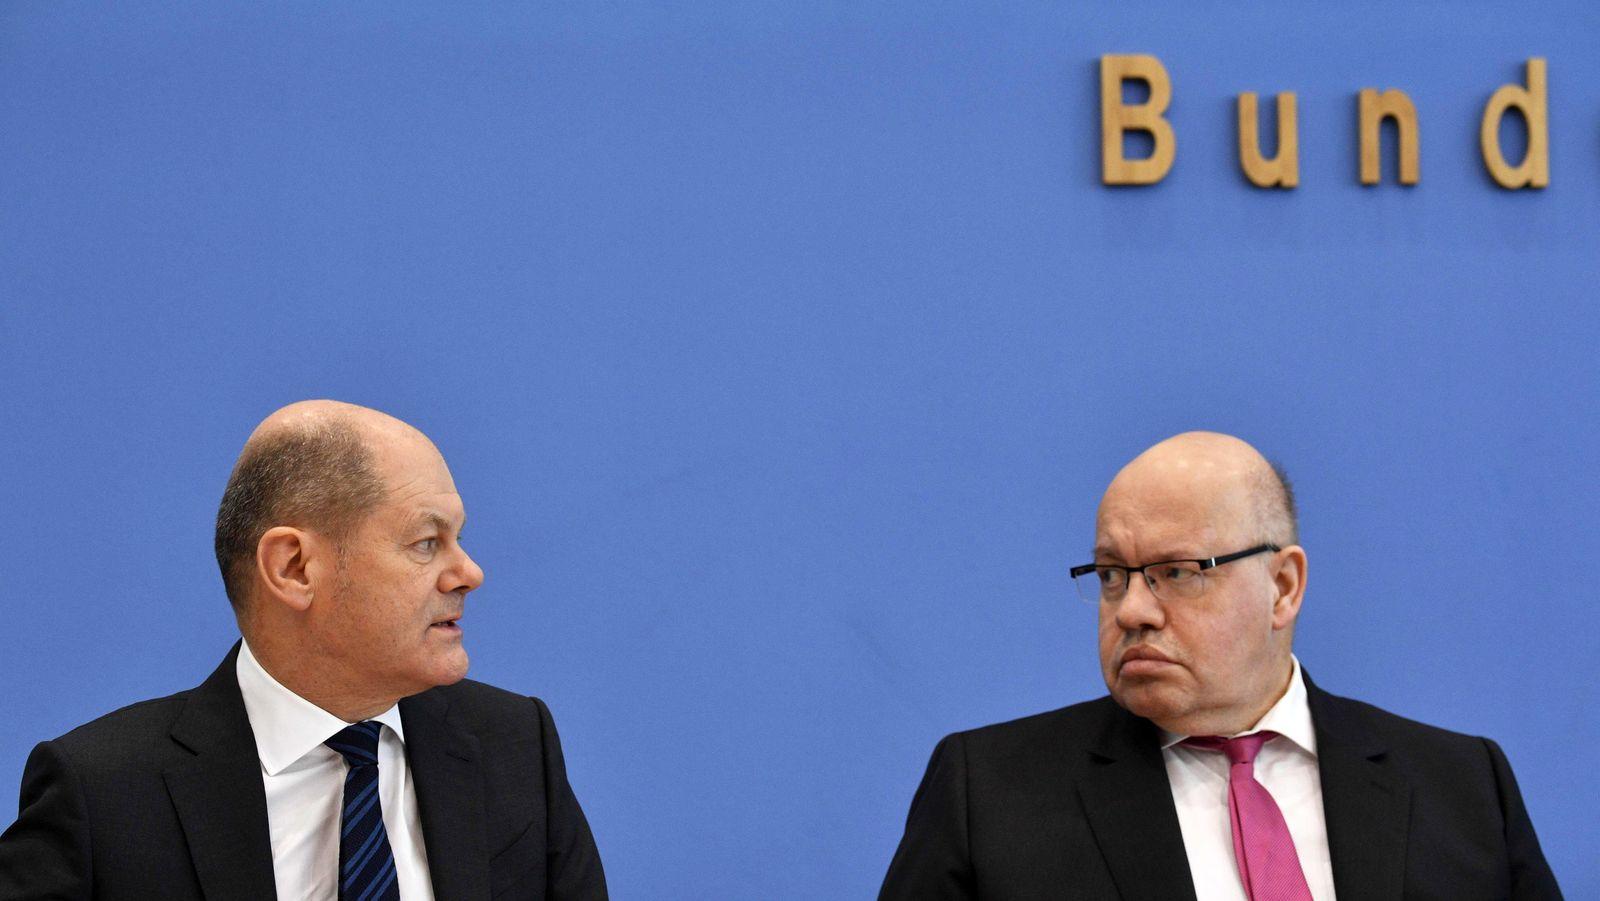 GERMANY-POLITICS-ECONOMY-HEALTH-VIRUS-PANDEMIC